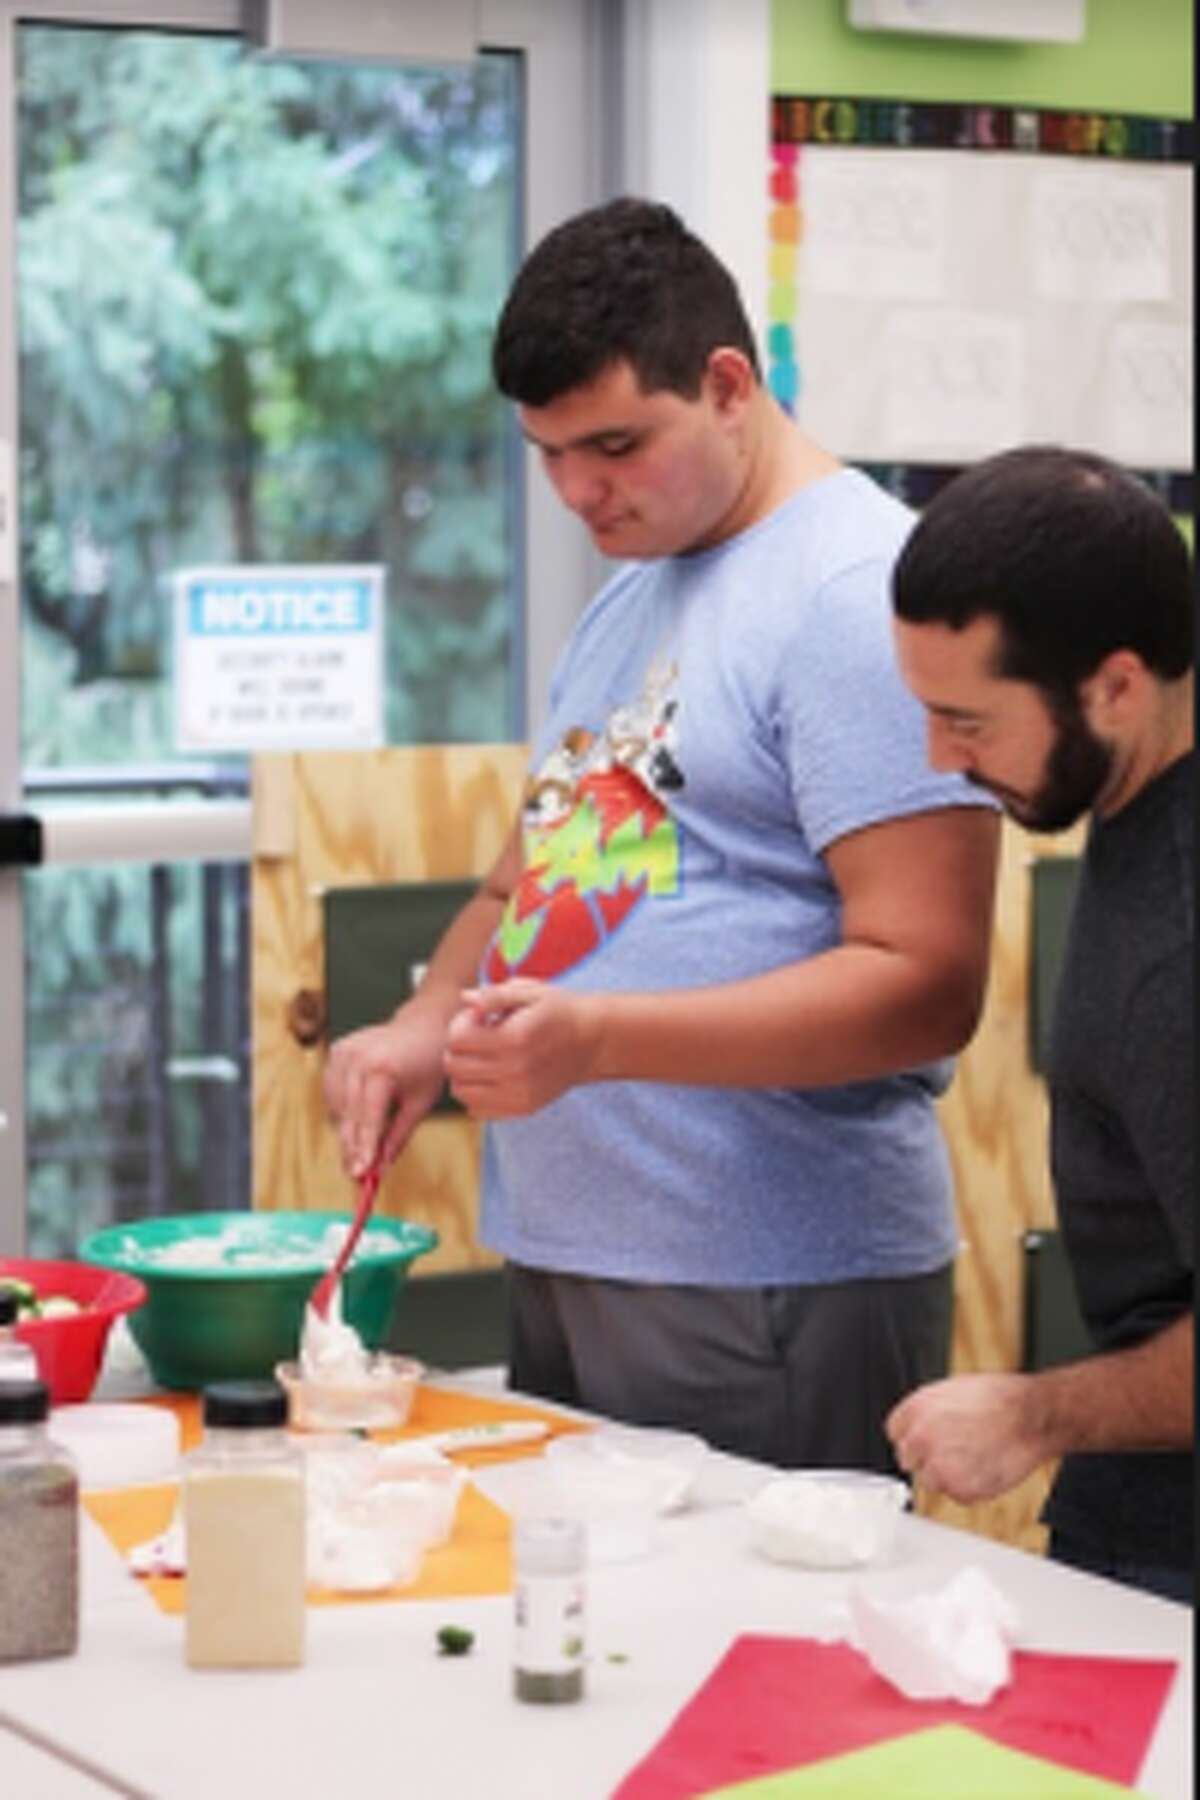 Jon Carlo Kearney, 19, gets assistance from Darien YMCA staff member Noel Senna in preparing snacks, as part of the Innovative Vocations program.